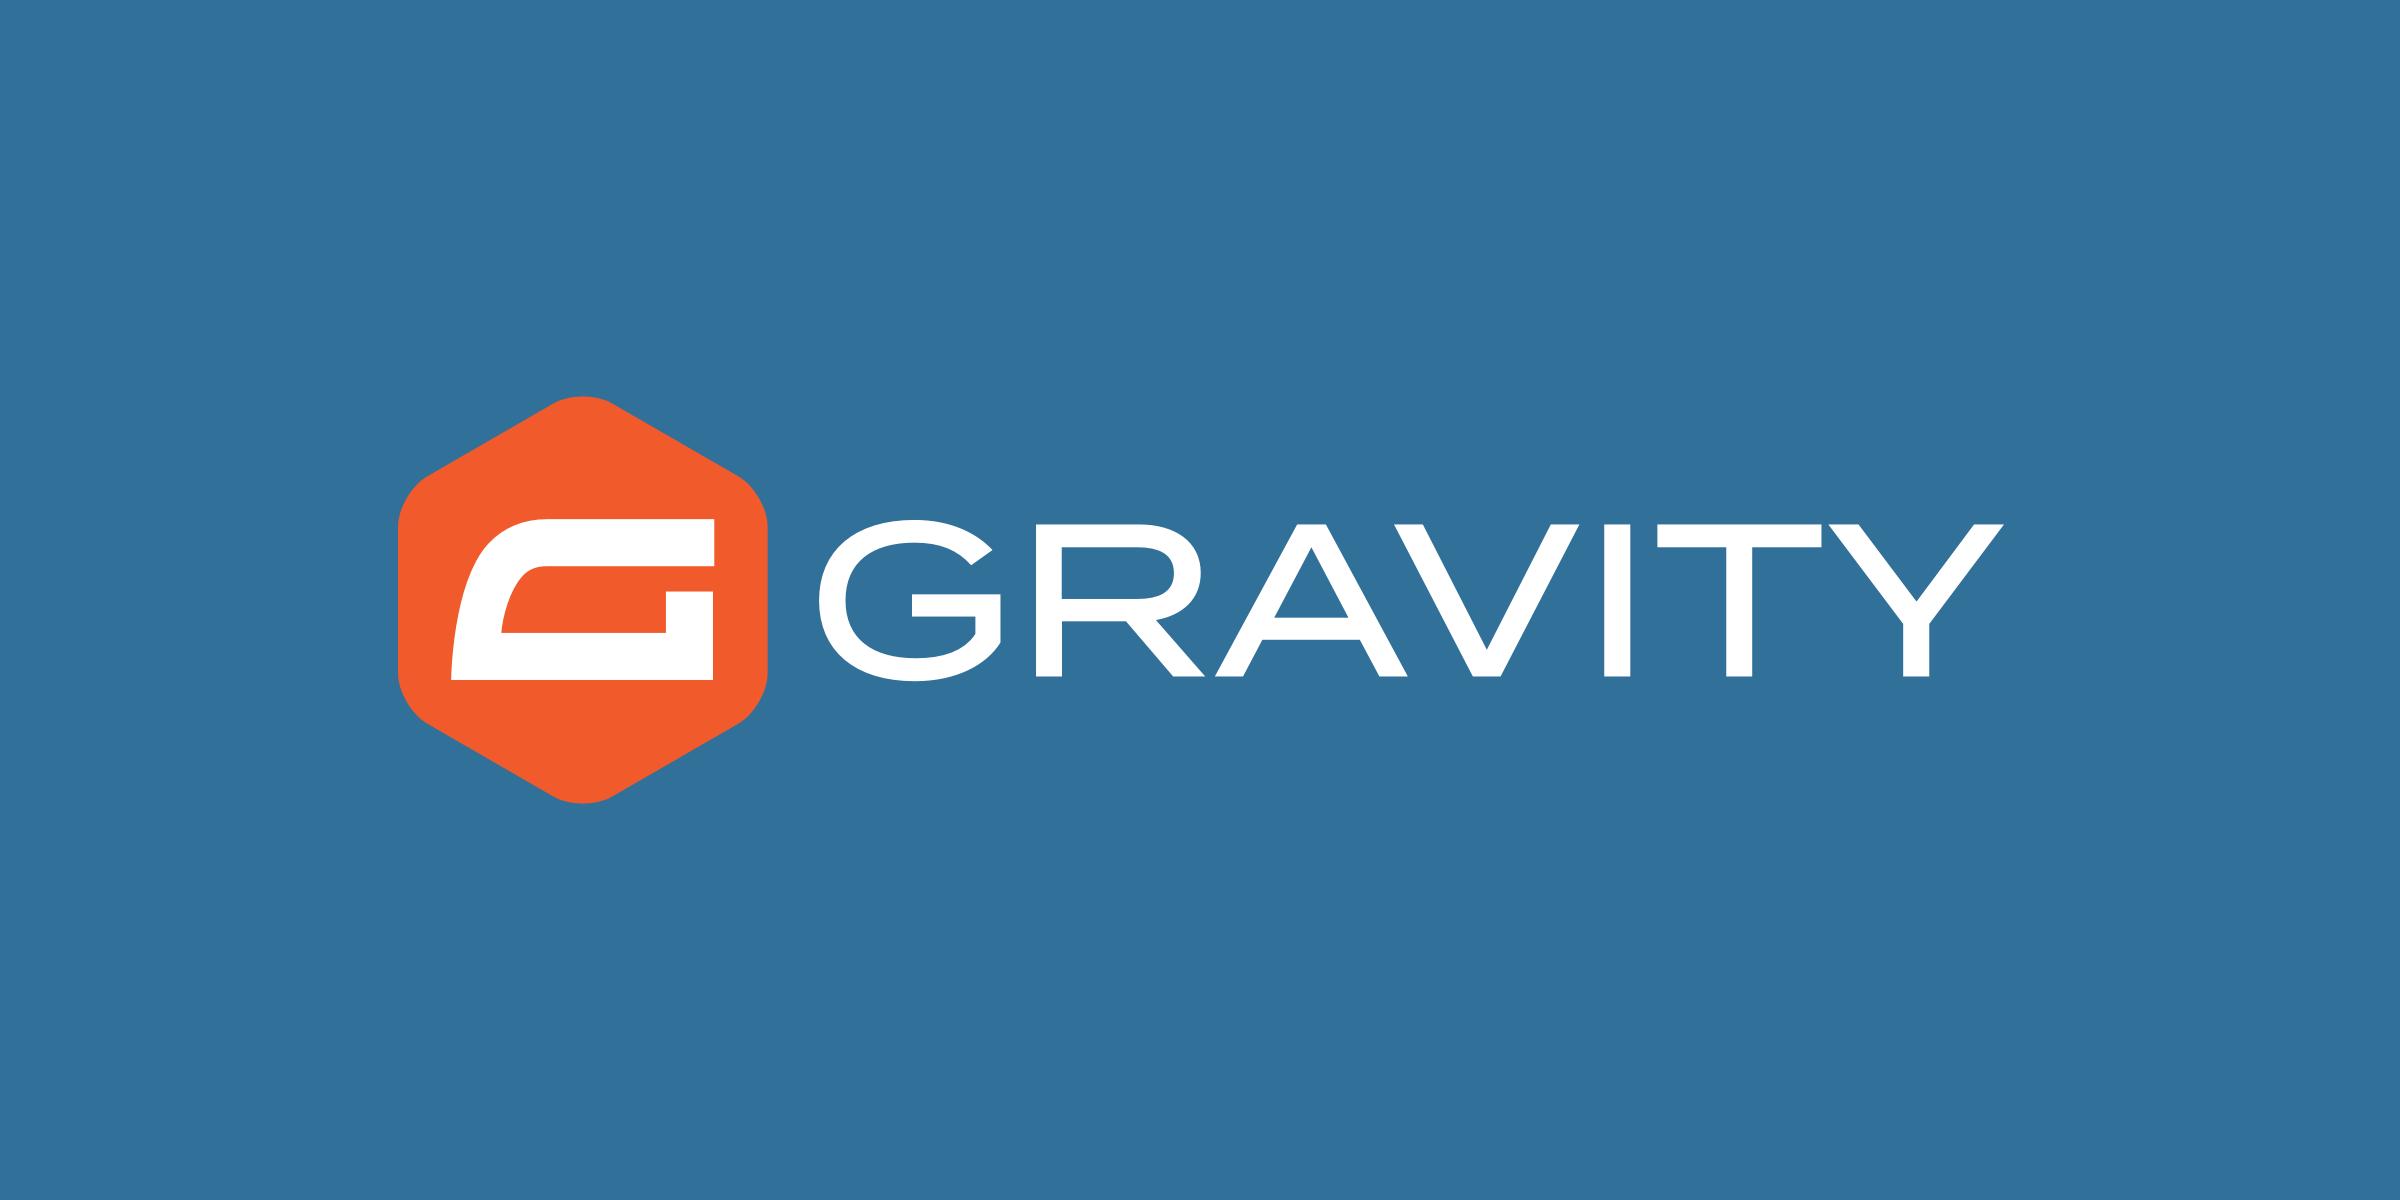 گراویتی فرم gravity form